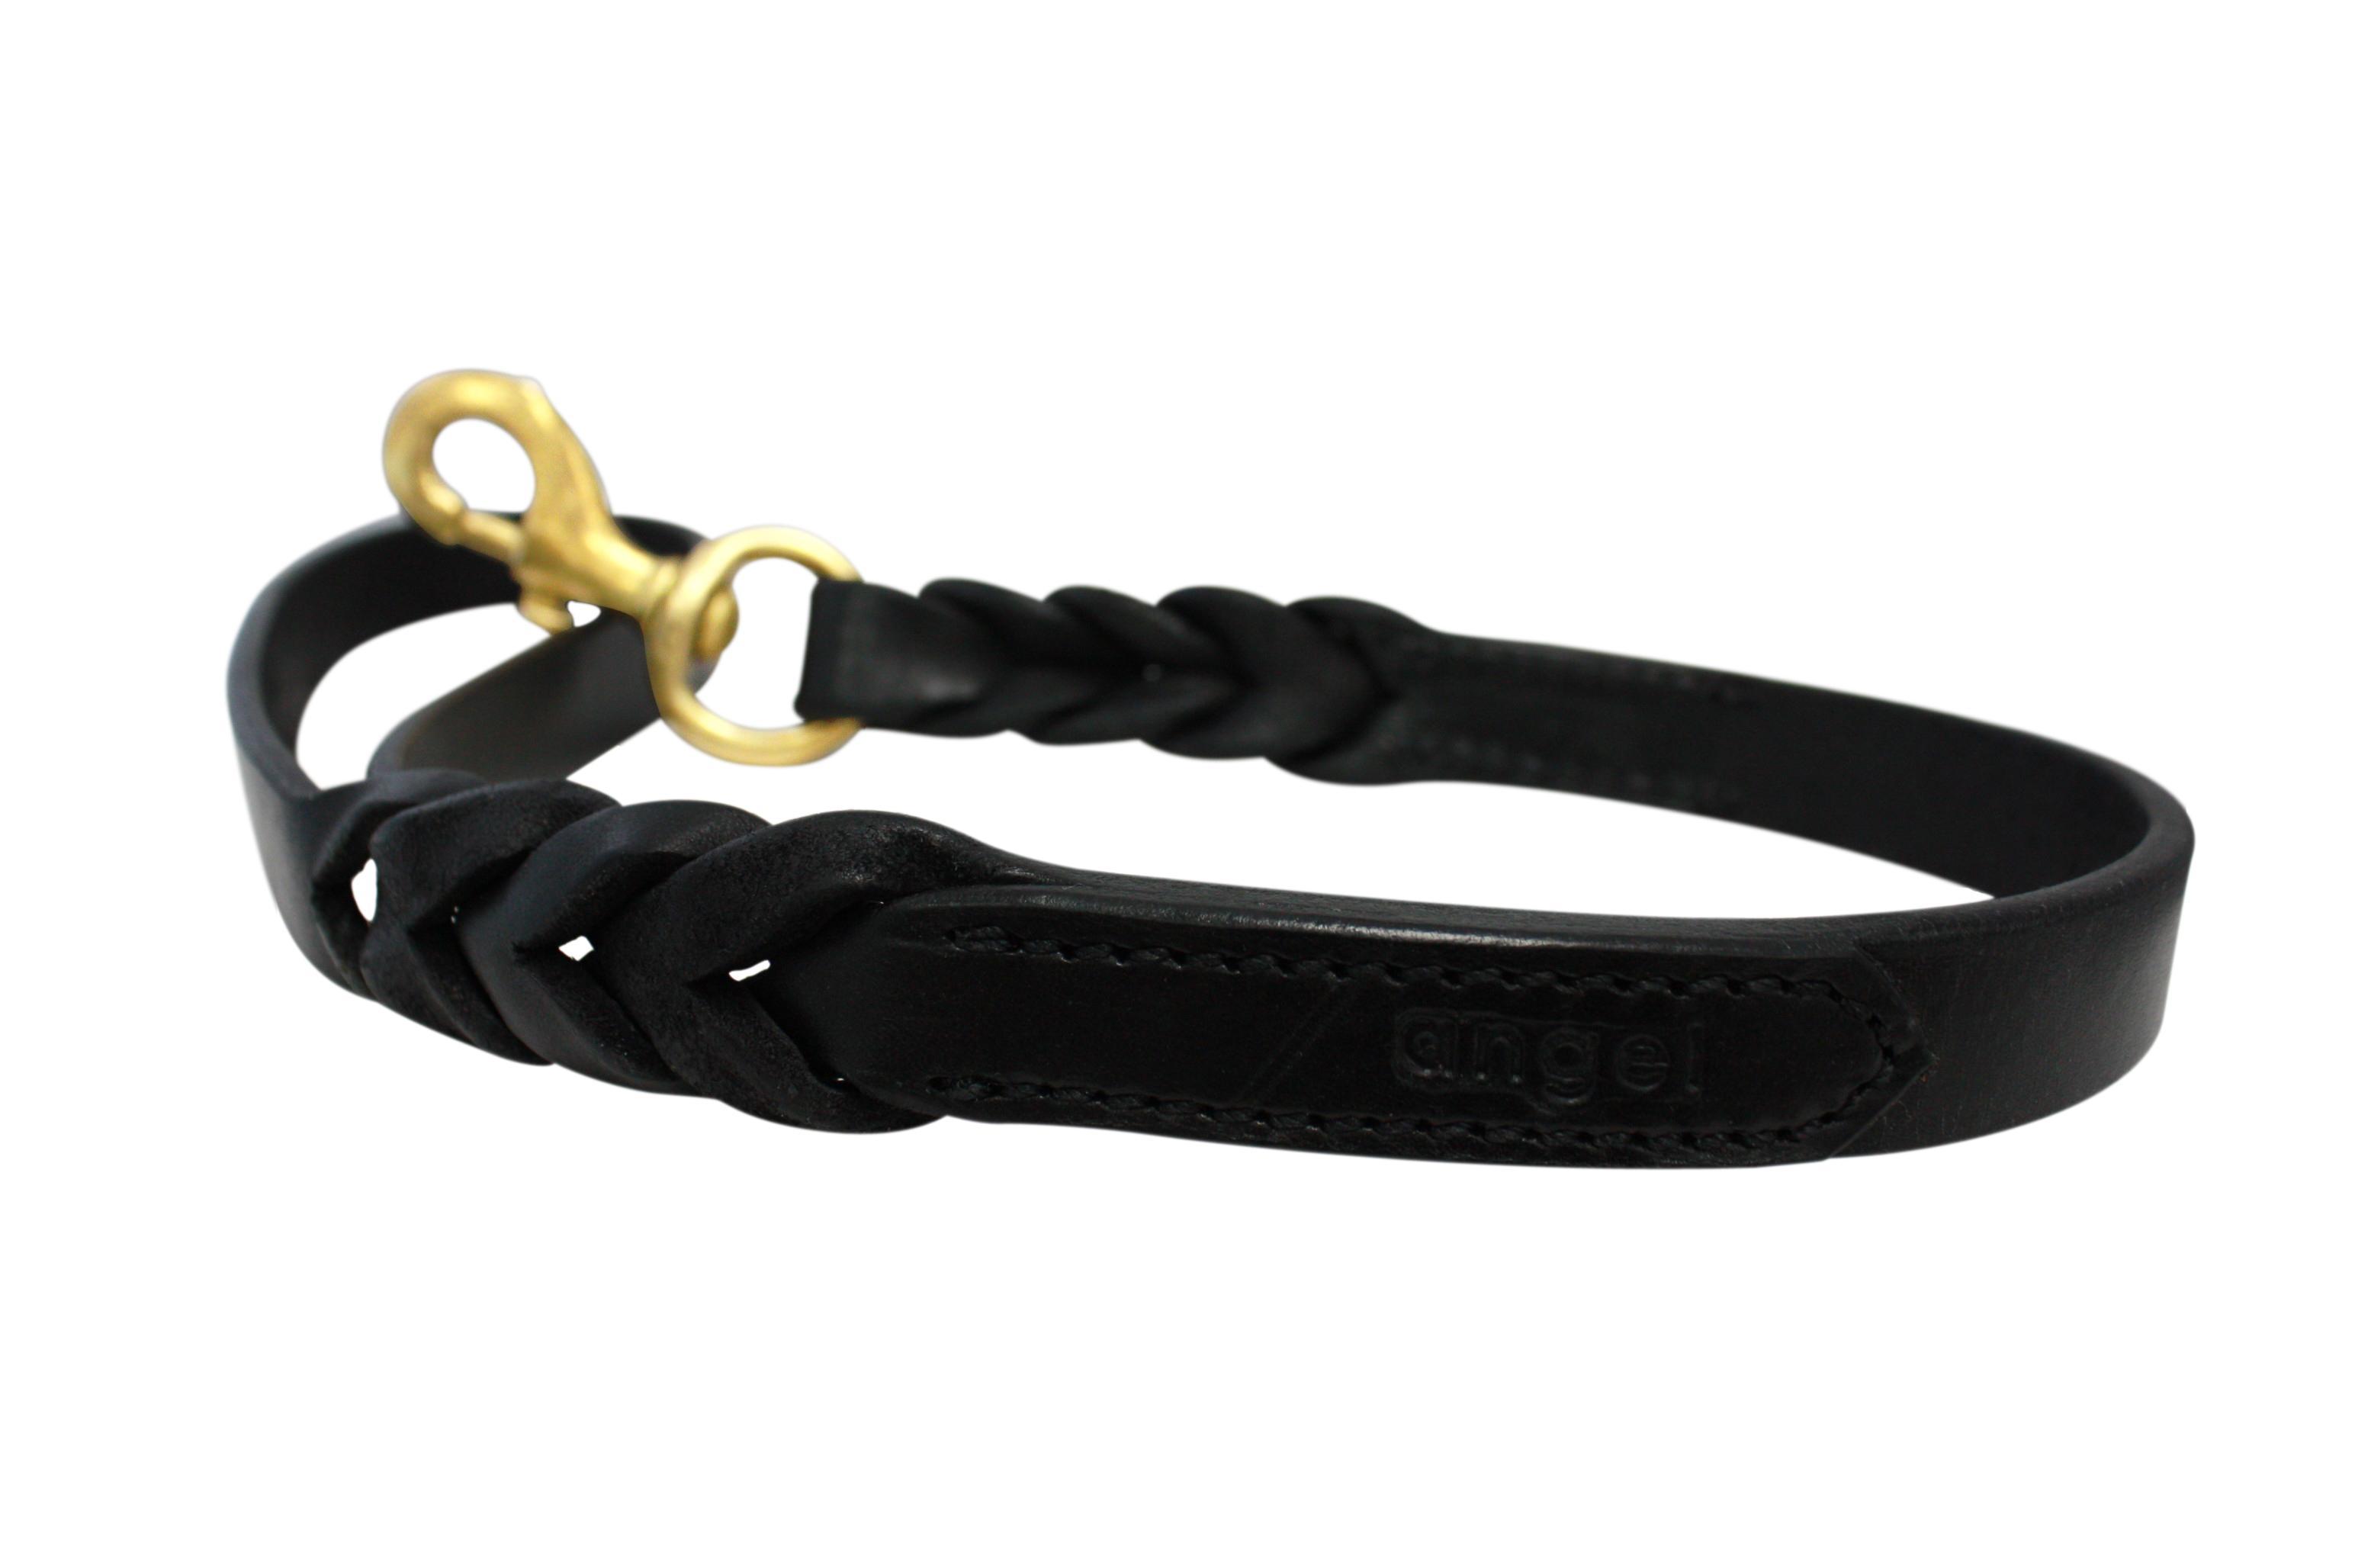 Angel Leather Braided Dog Leash, Black, 6-ft x 1-in